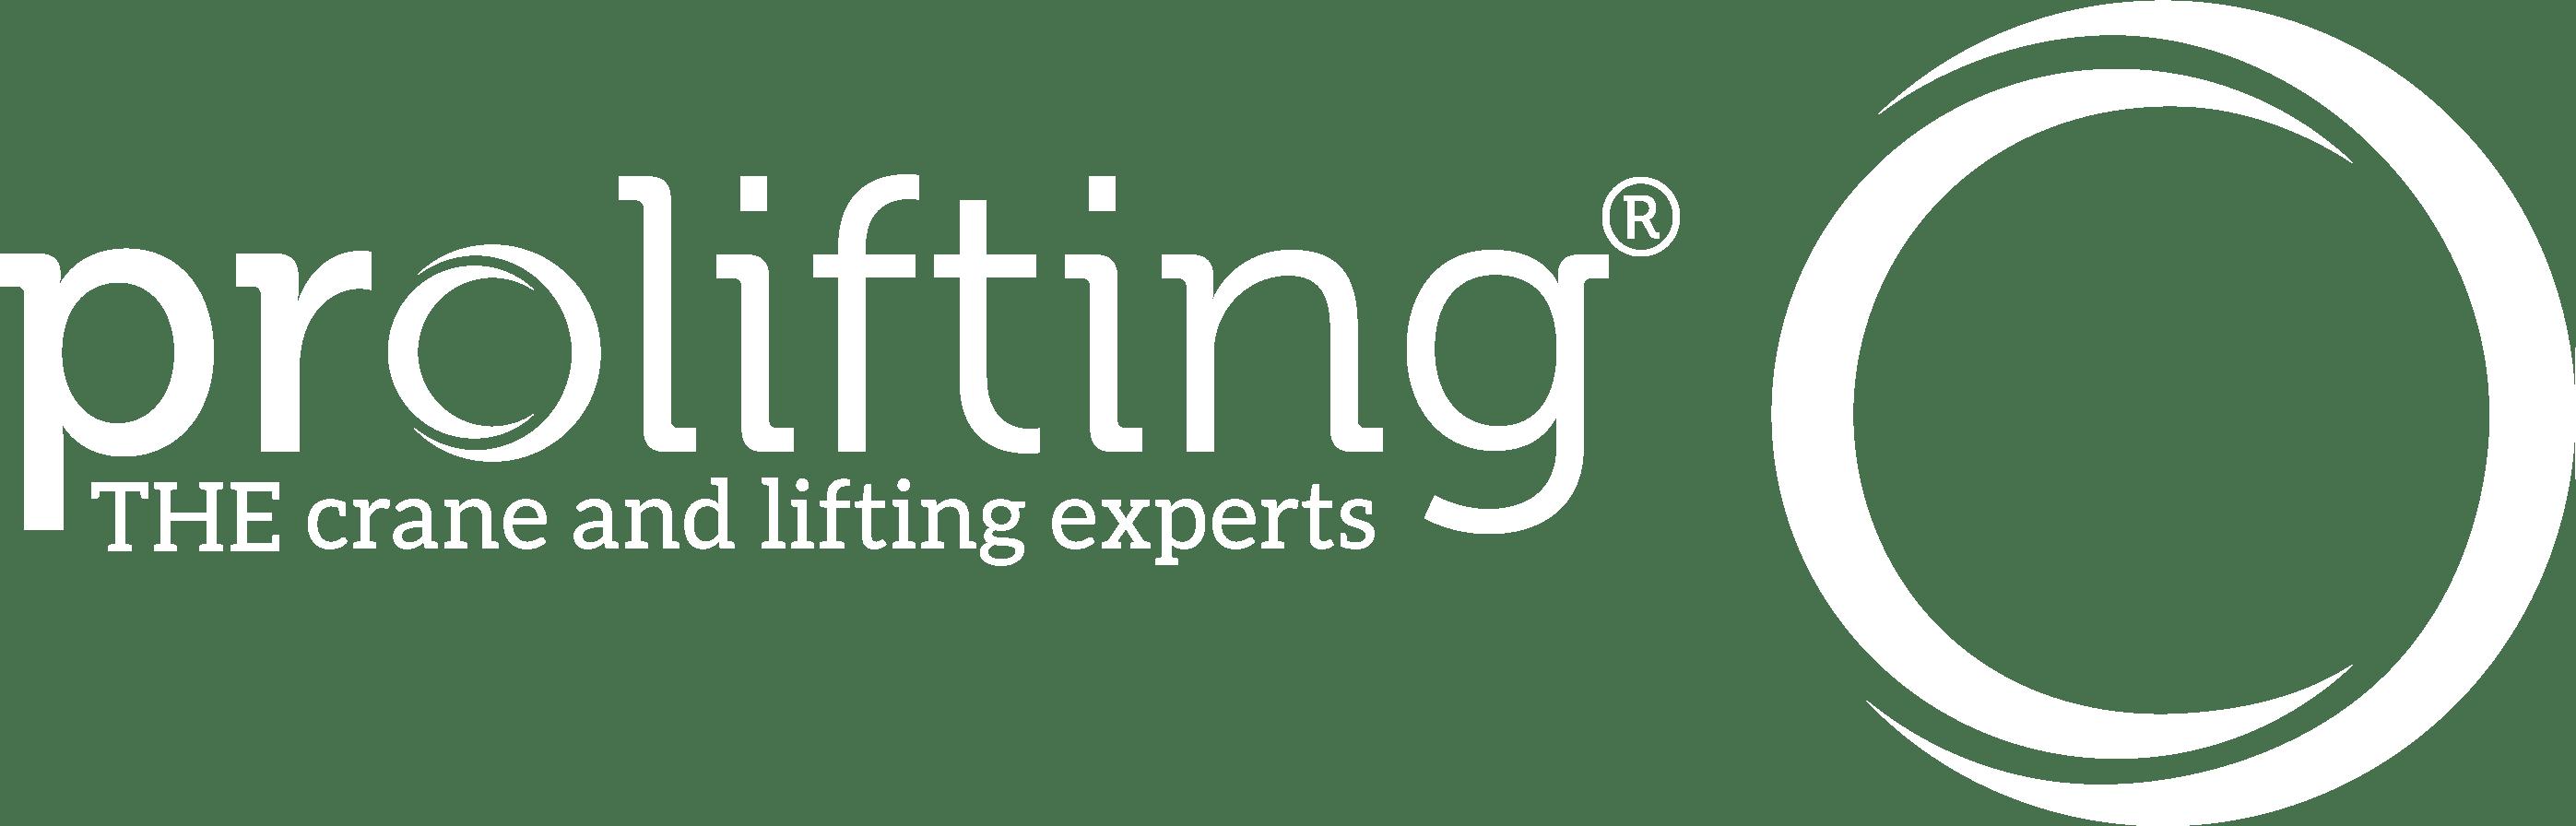 prolifting